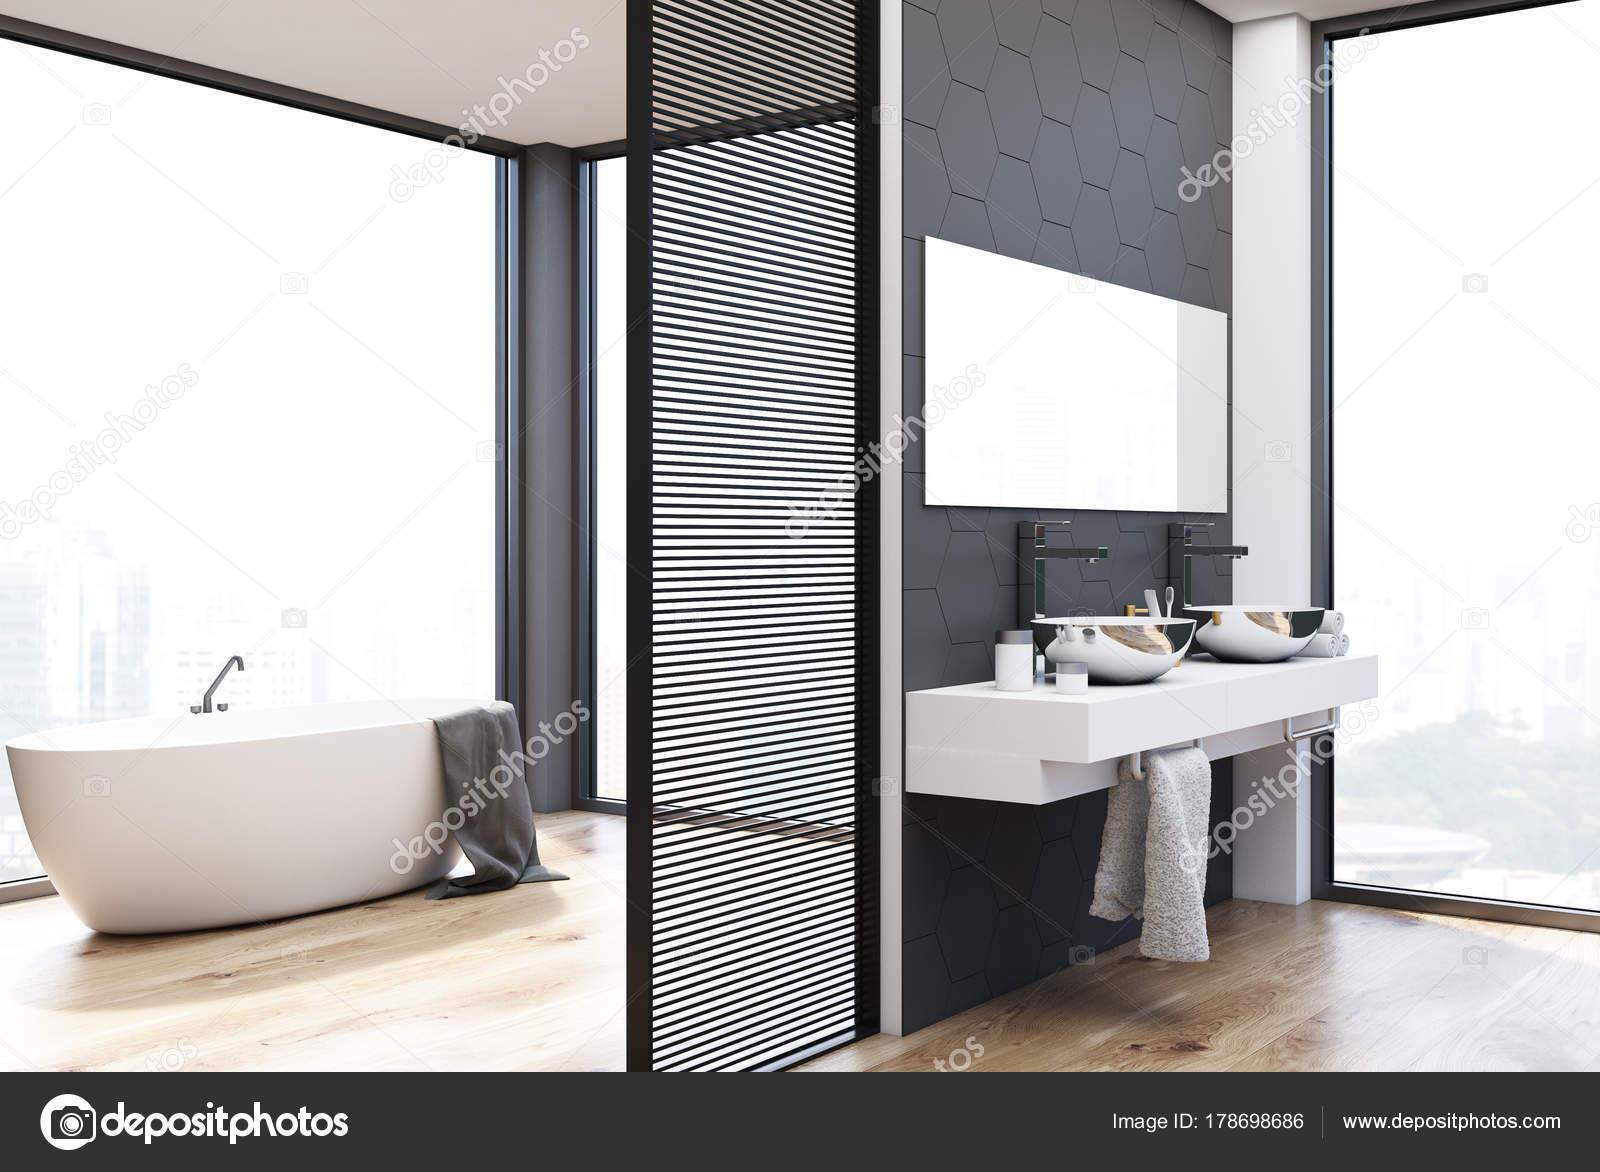 Hexagon Tegels Badkamer : Grijze hexagon tegels badkamer dubbele wastafel en bad